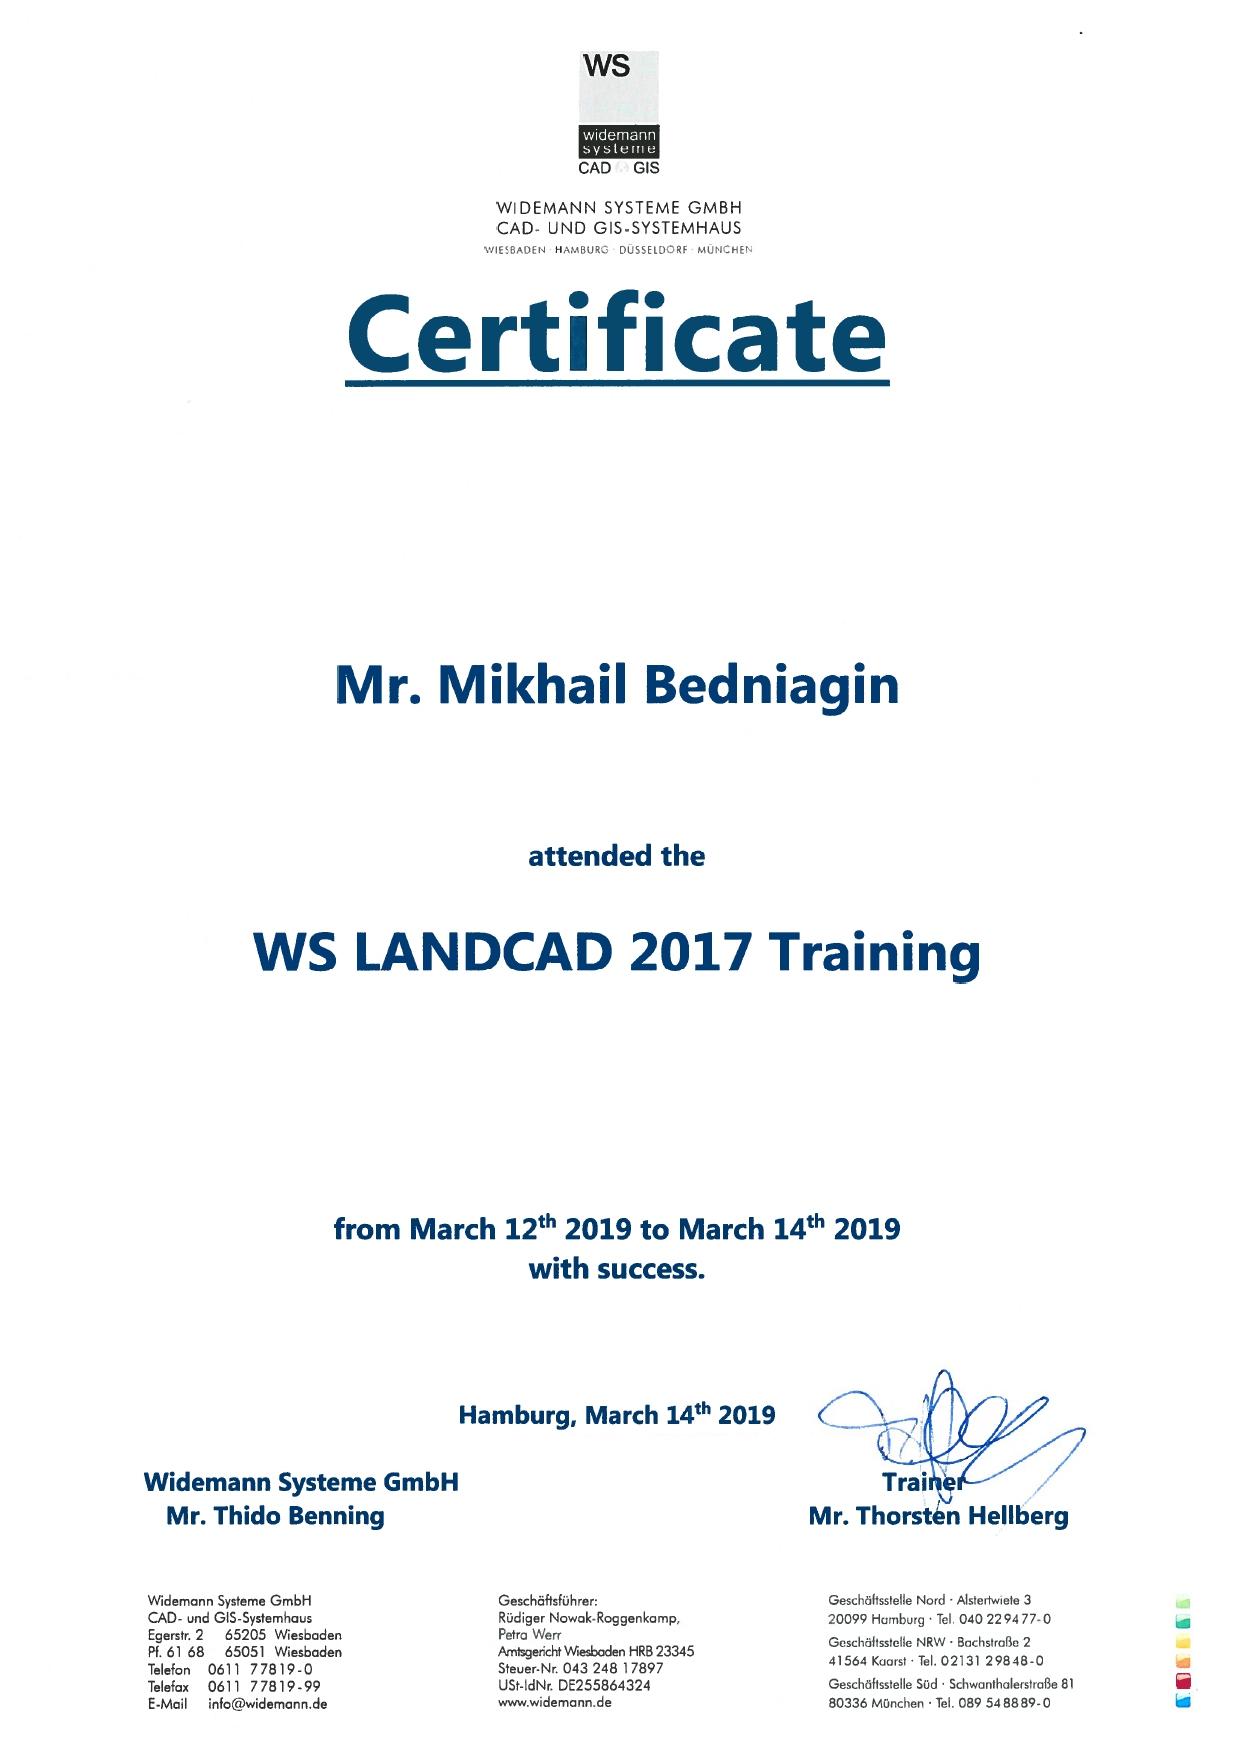 Сертификат Landcad Беднягин19